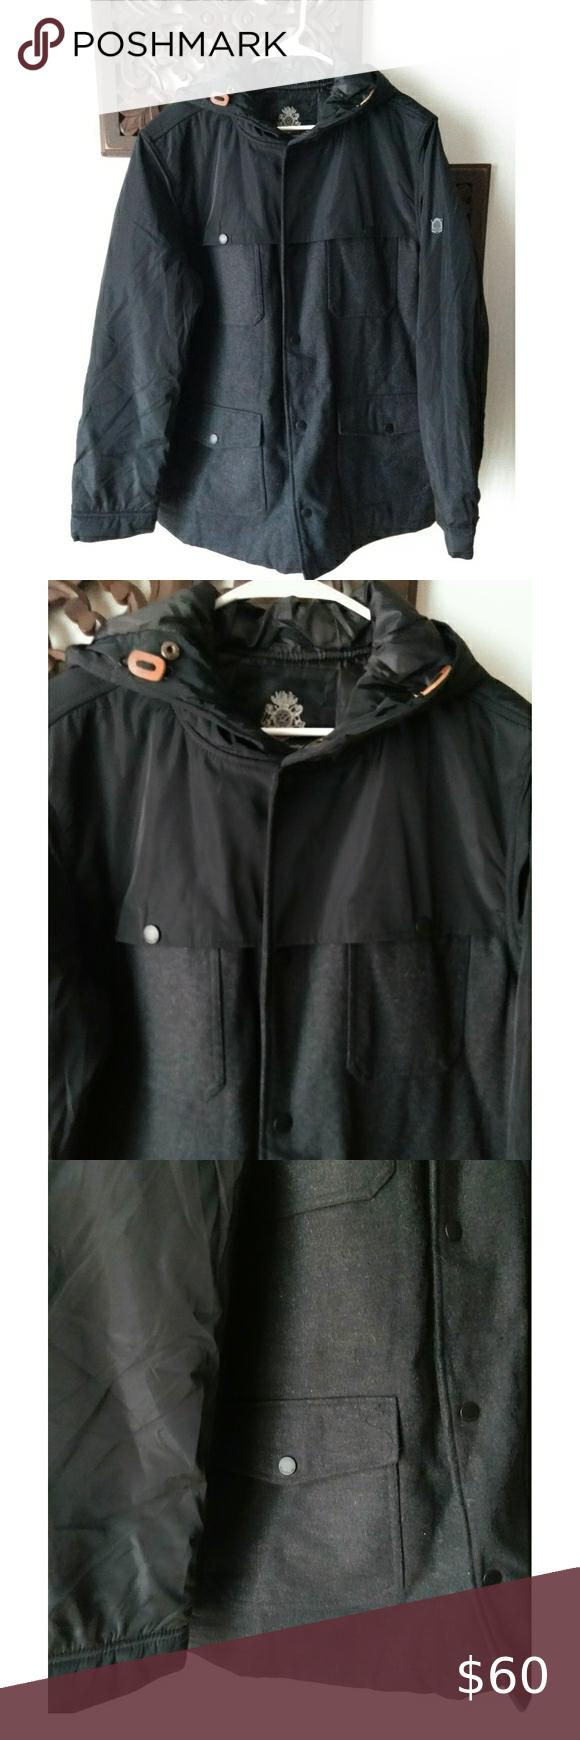 English Laundry Men S Jacket Hooded Jacket Men Clothes Design Fashion [ 1740 x 580 Pixel ]